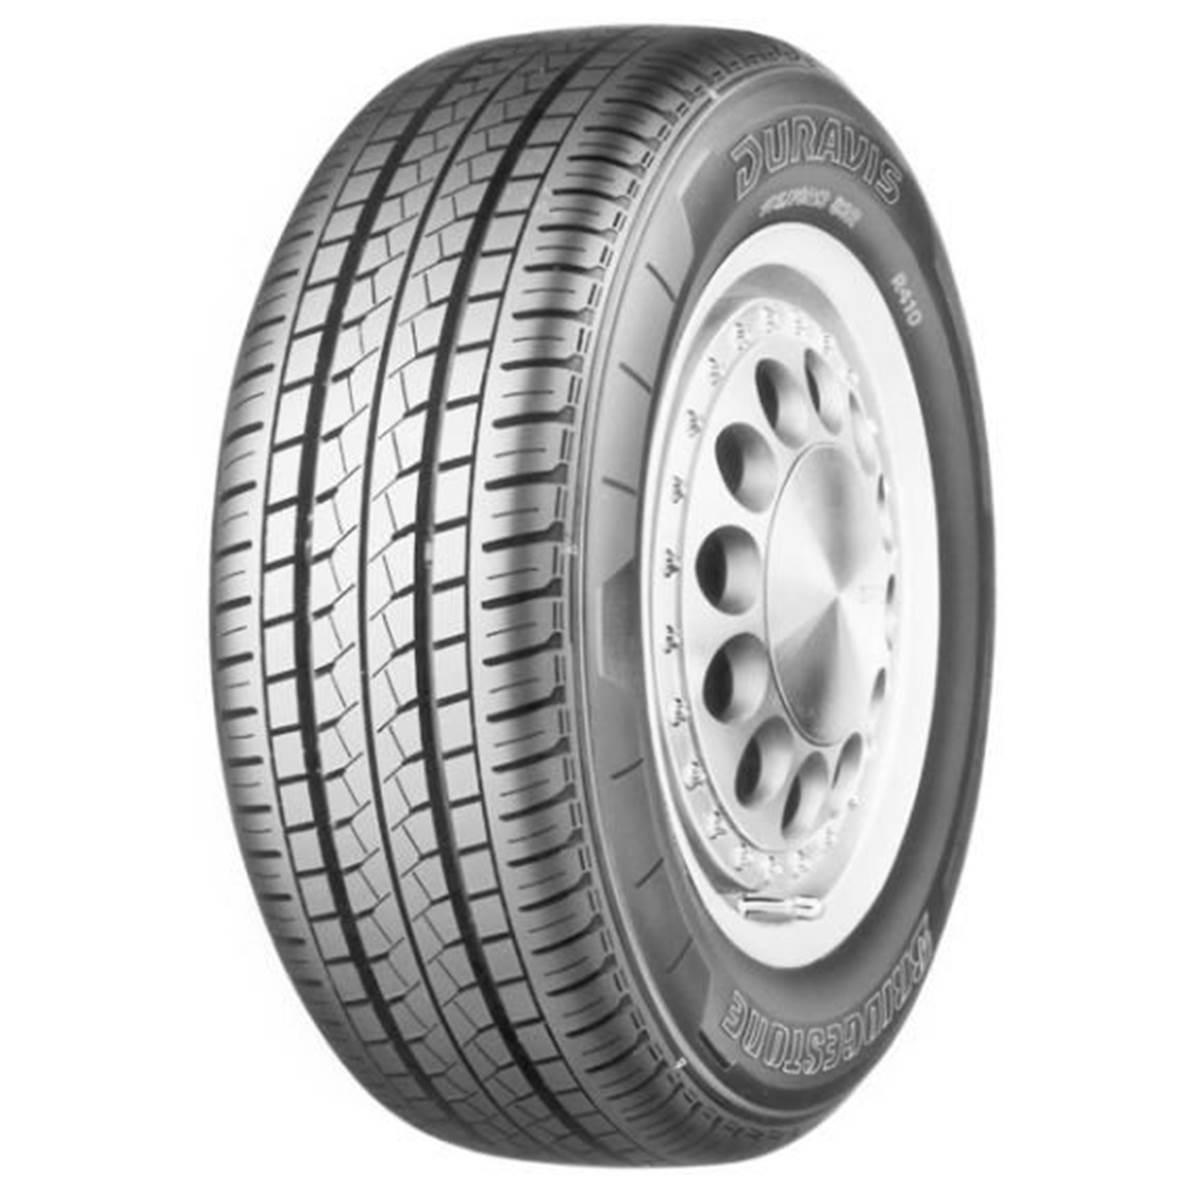 Pneu Camionnette Bridgestone 215/65R16 102H Duravis R410